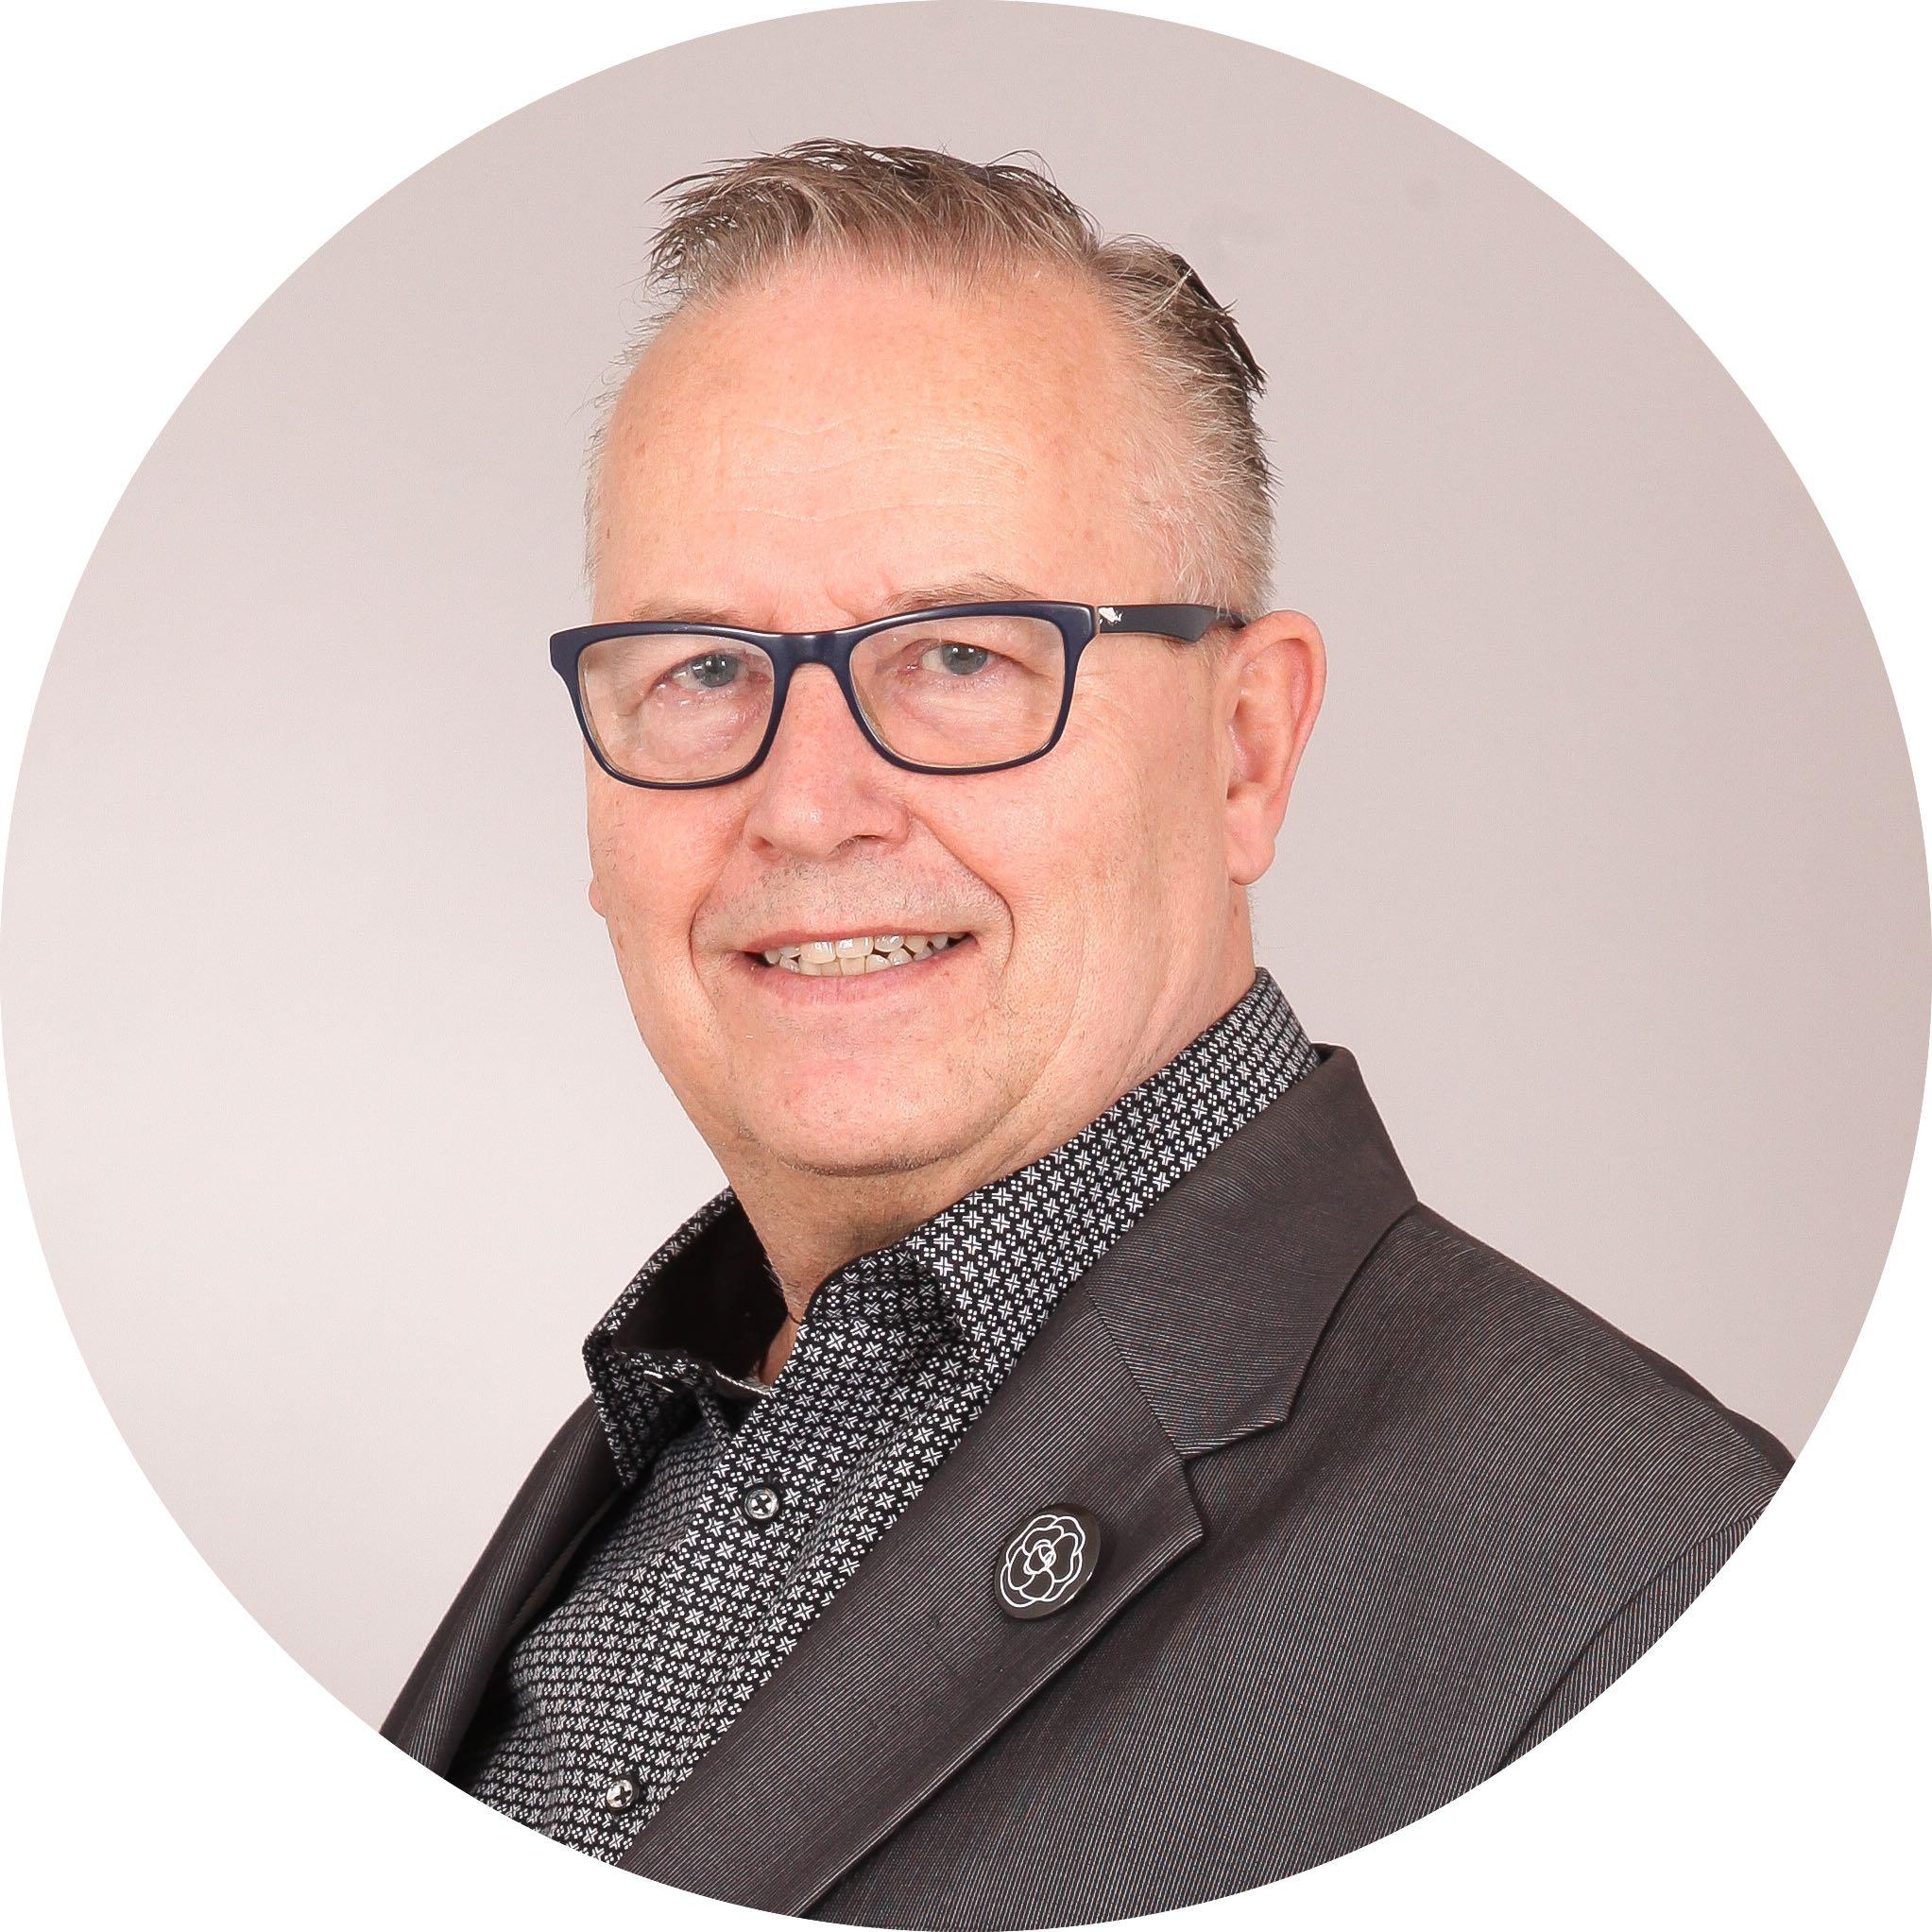 Cartografisch Consulent Jan van der Wolde